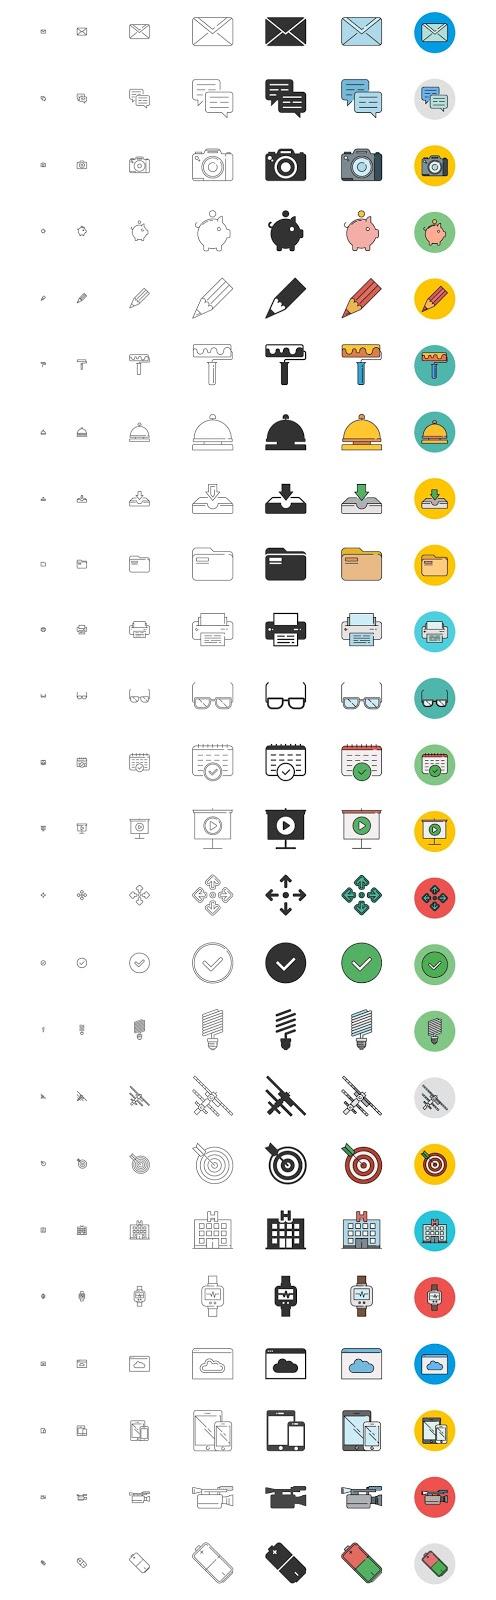 192 Free Responsive Icons Set